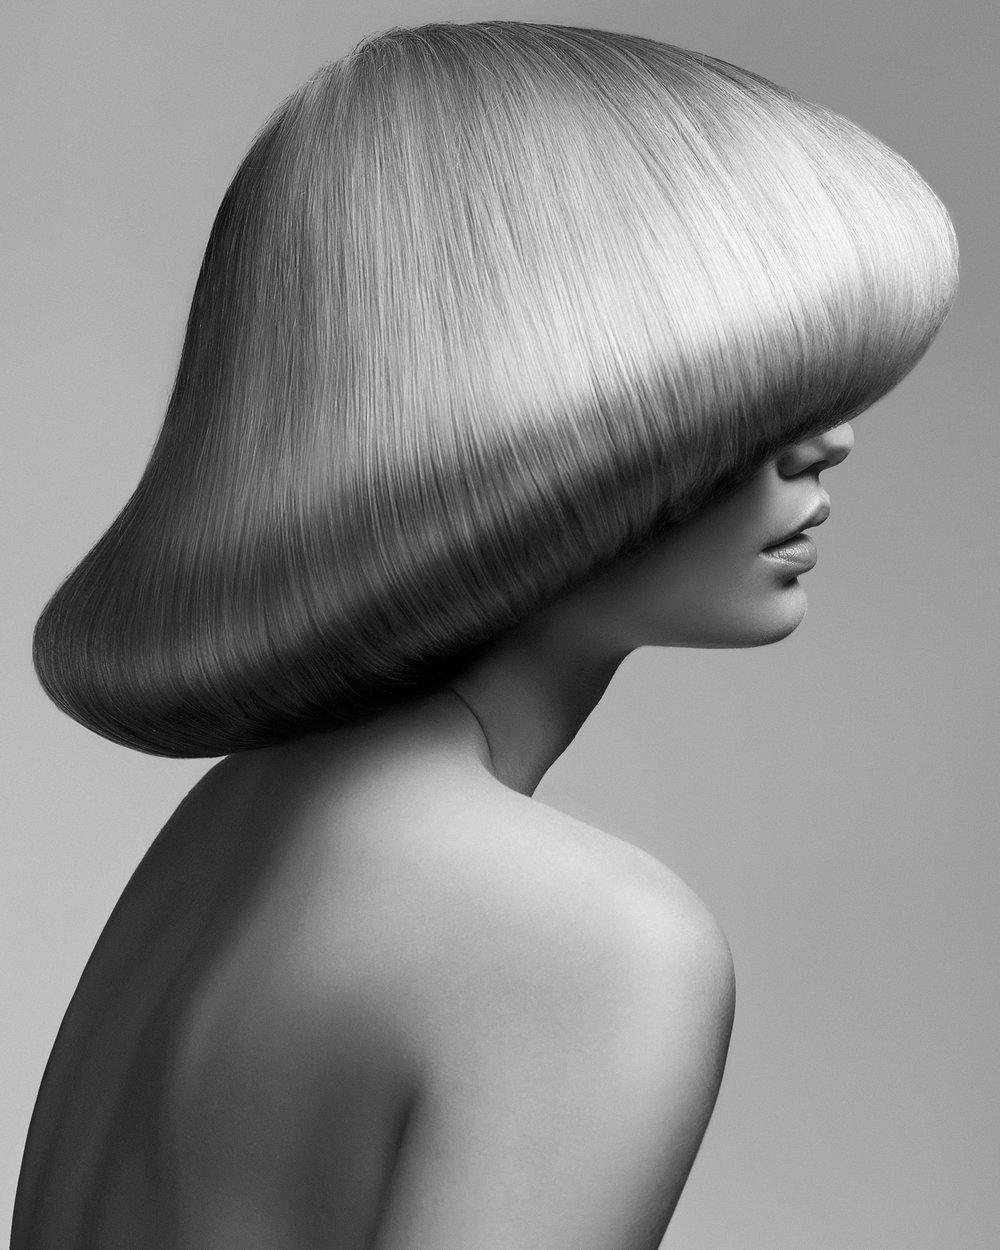 Jack_Eames_Kim_Roy_Hair_Beauty_Photography_London_01.jpg